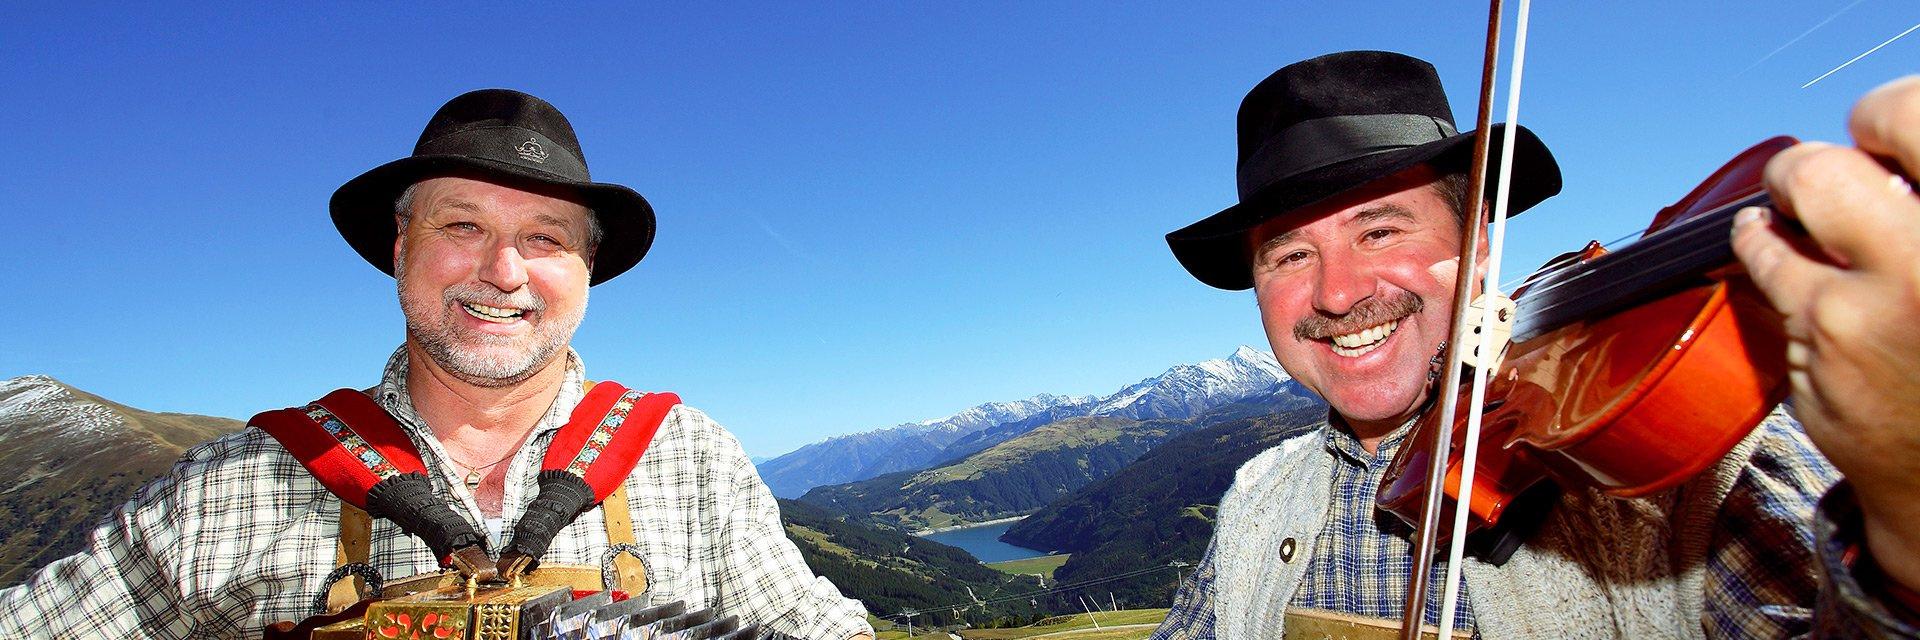 hotel pension alpina